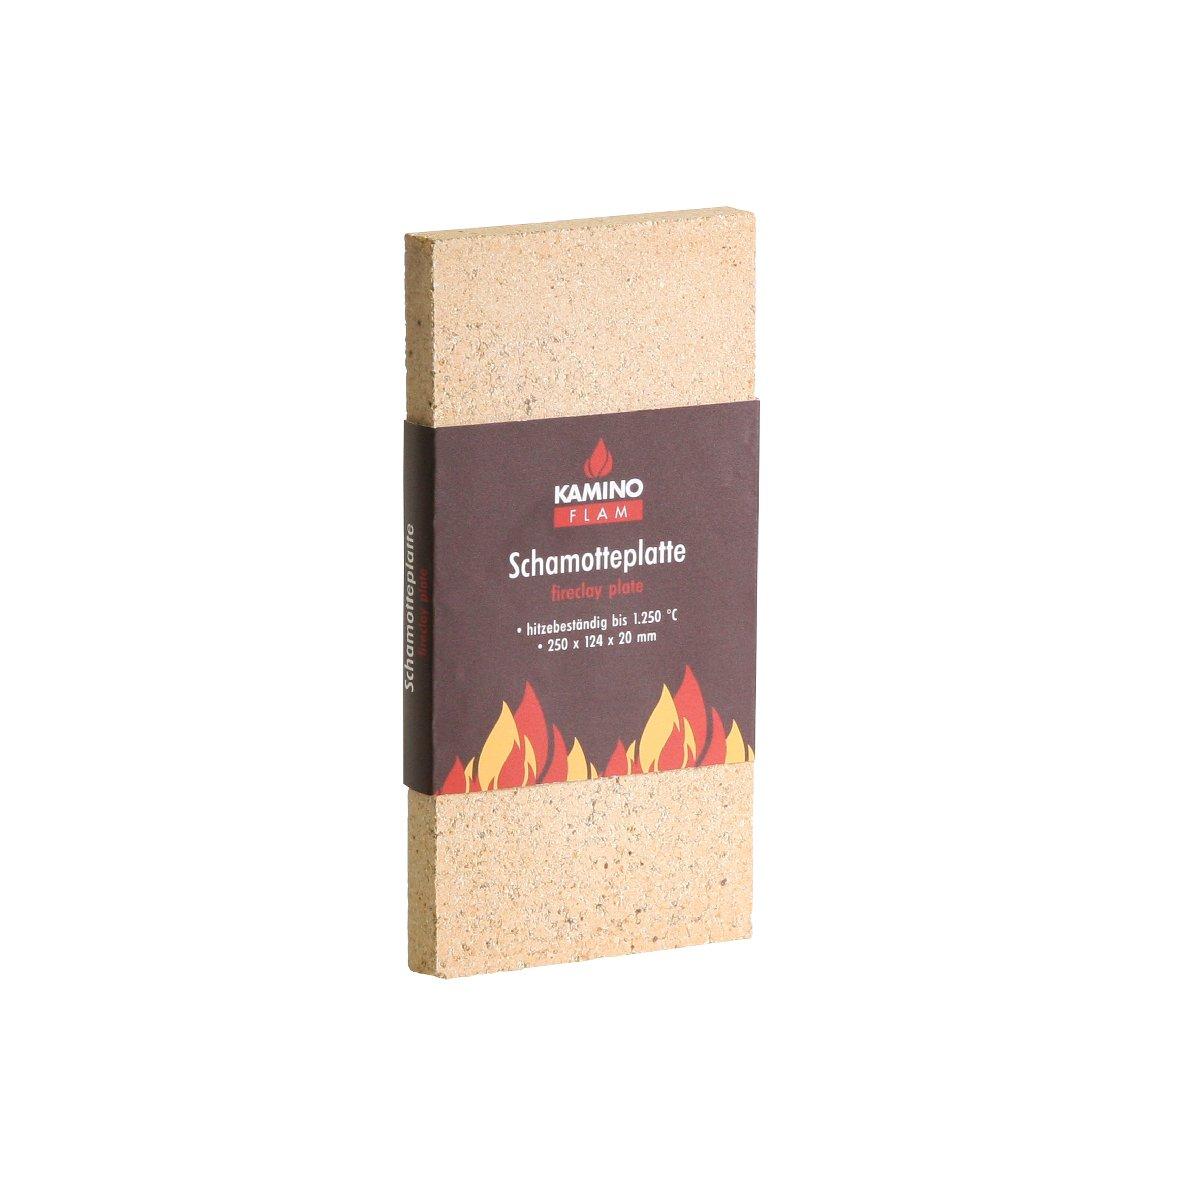 Kamino-Flam – Plancha chamota (25/12,4/2 cm), Placa protectora para chimenea, estufa, horno, Panel aislante, Plancha refractaria, Panel ignífugo – resistente a altas temperaturas hasta 1250°C Kamino - Flam 333301